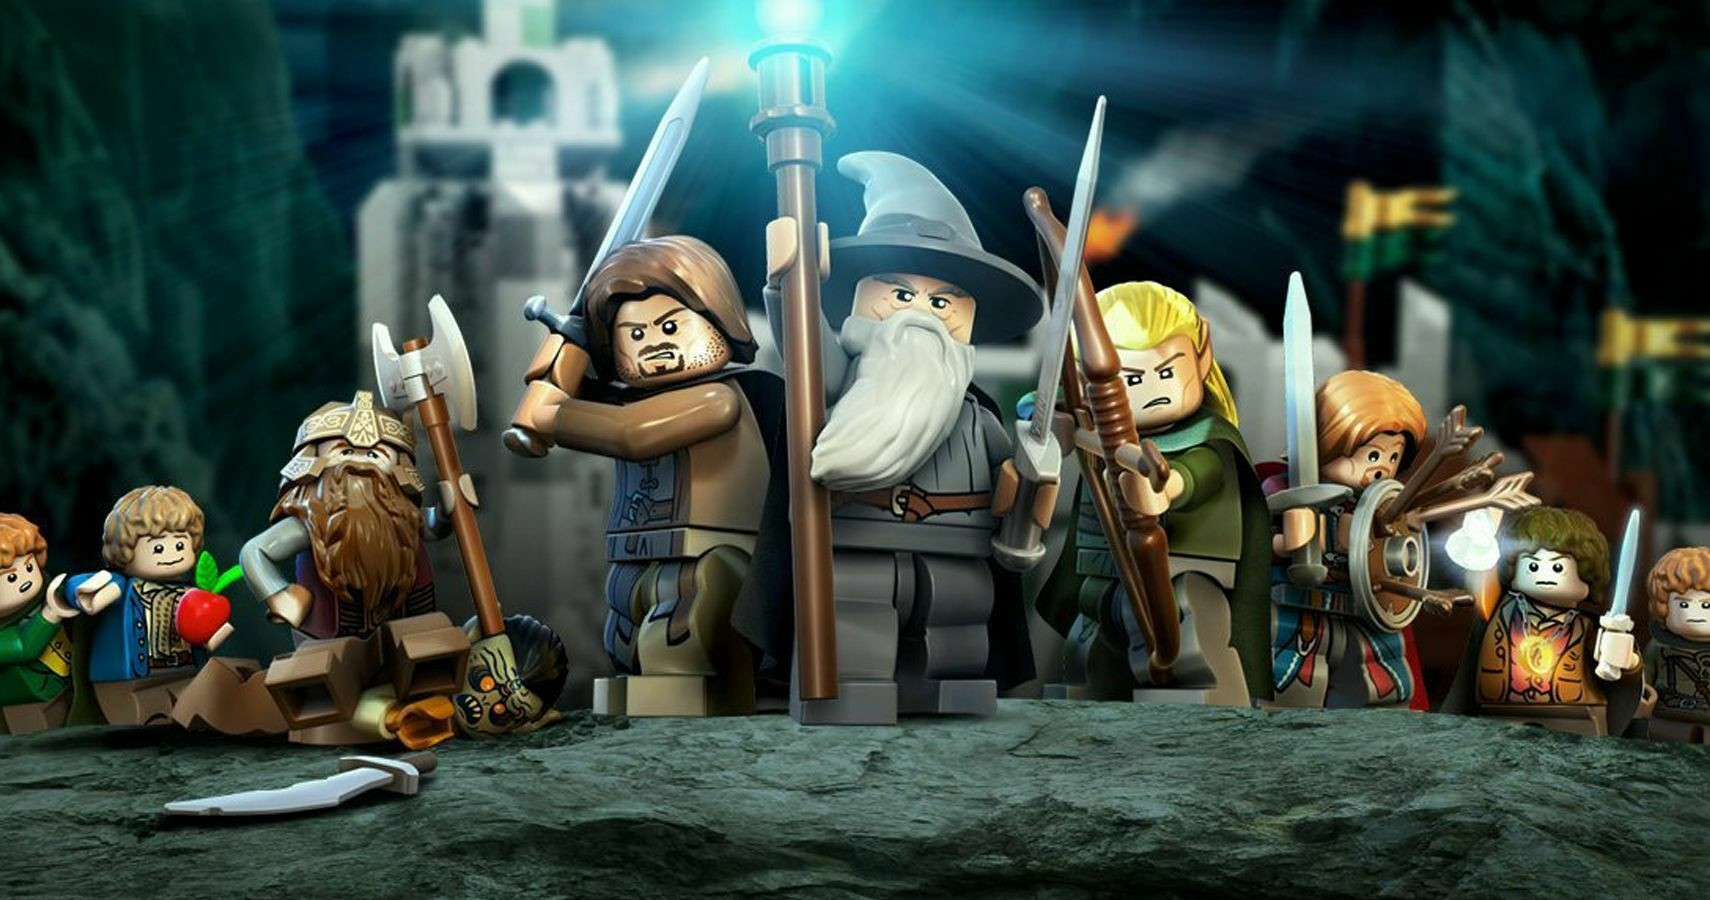 LEGO The Lord ofthe Rings вернулась вSteam. Еенебыло больше года